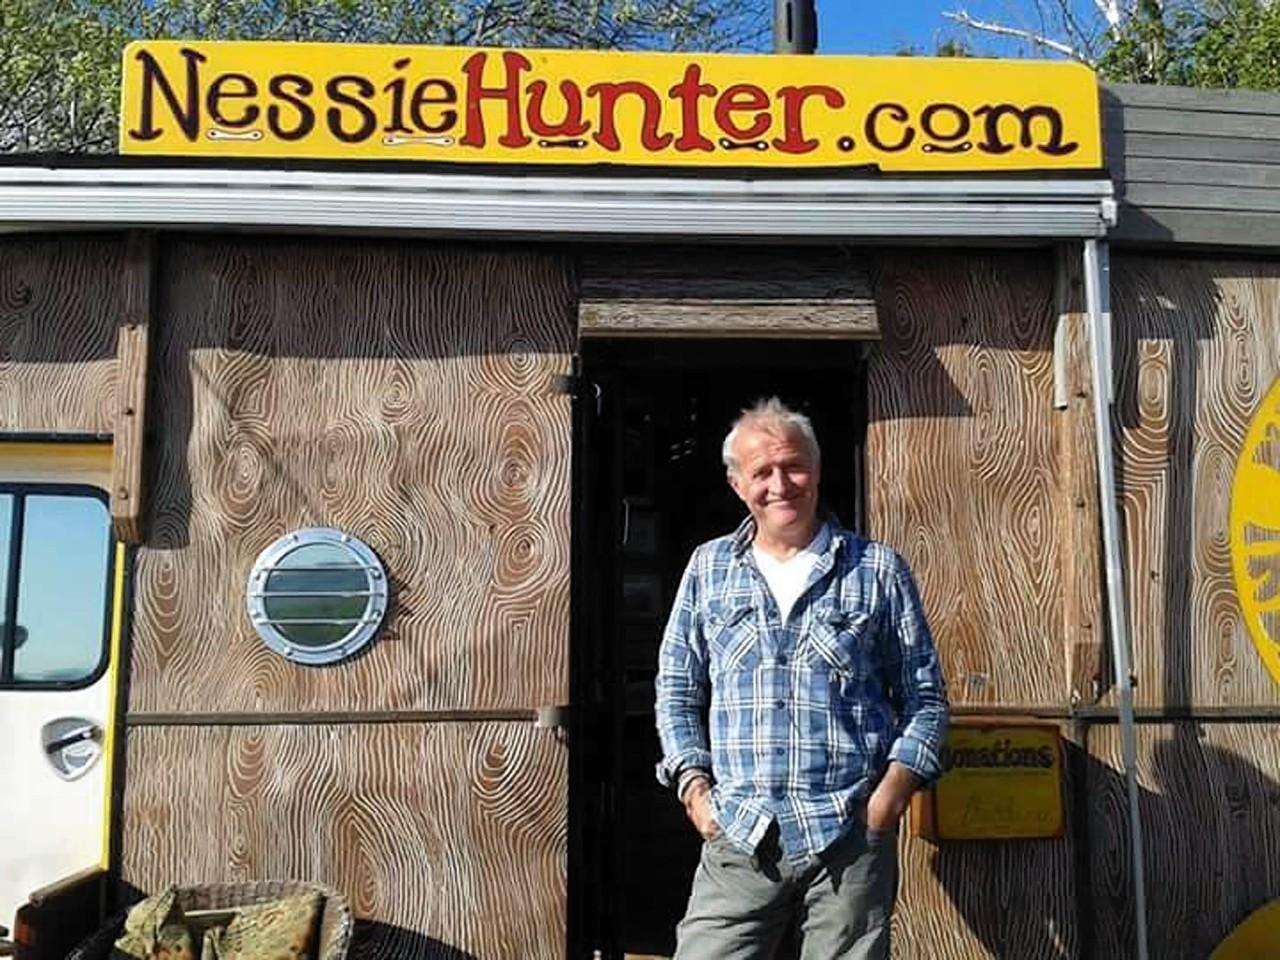 Steve Feltham world famous Nessie Hunter and now, sceptic